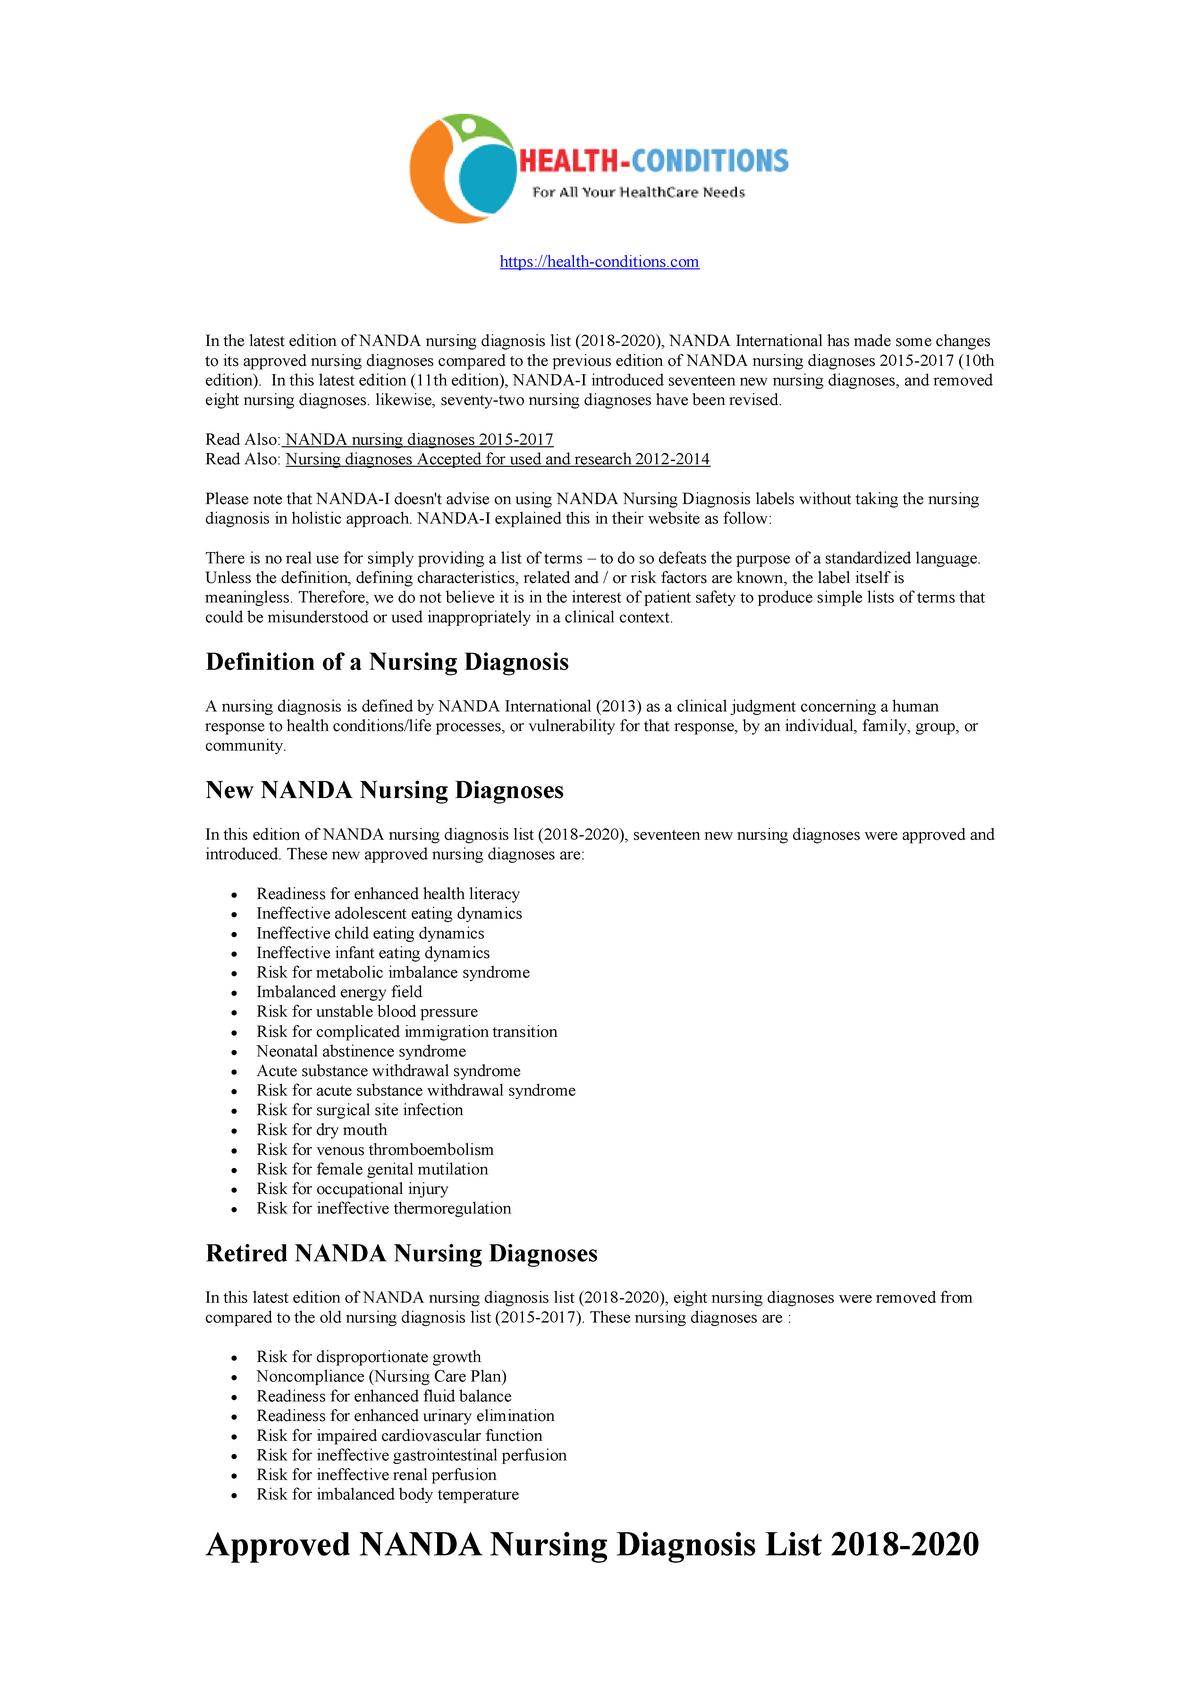 Nanda Nursing Diagnosis List 2018 2020 Warning Tt Undefined Function 22 Https Studocu